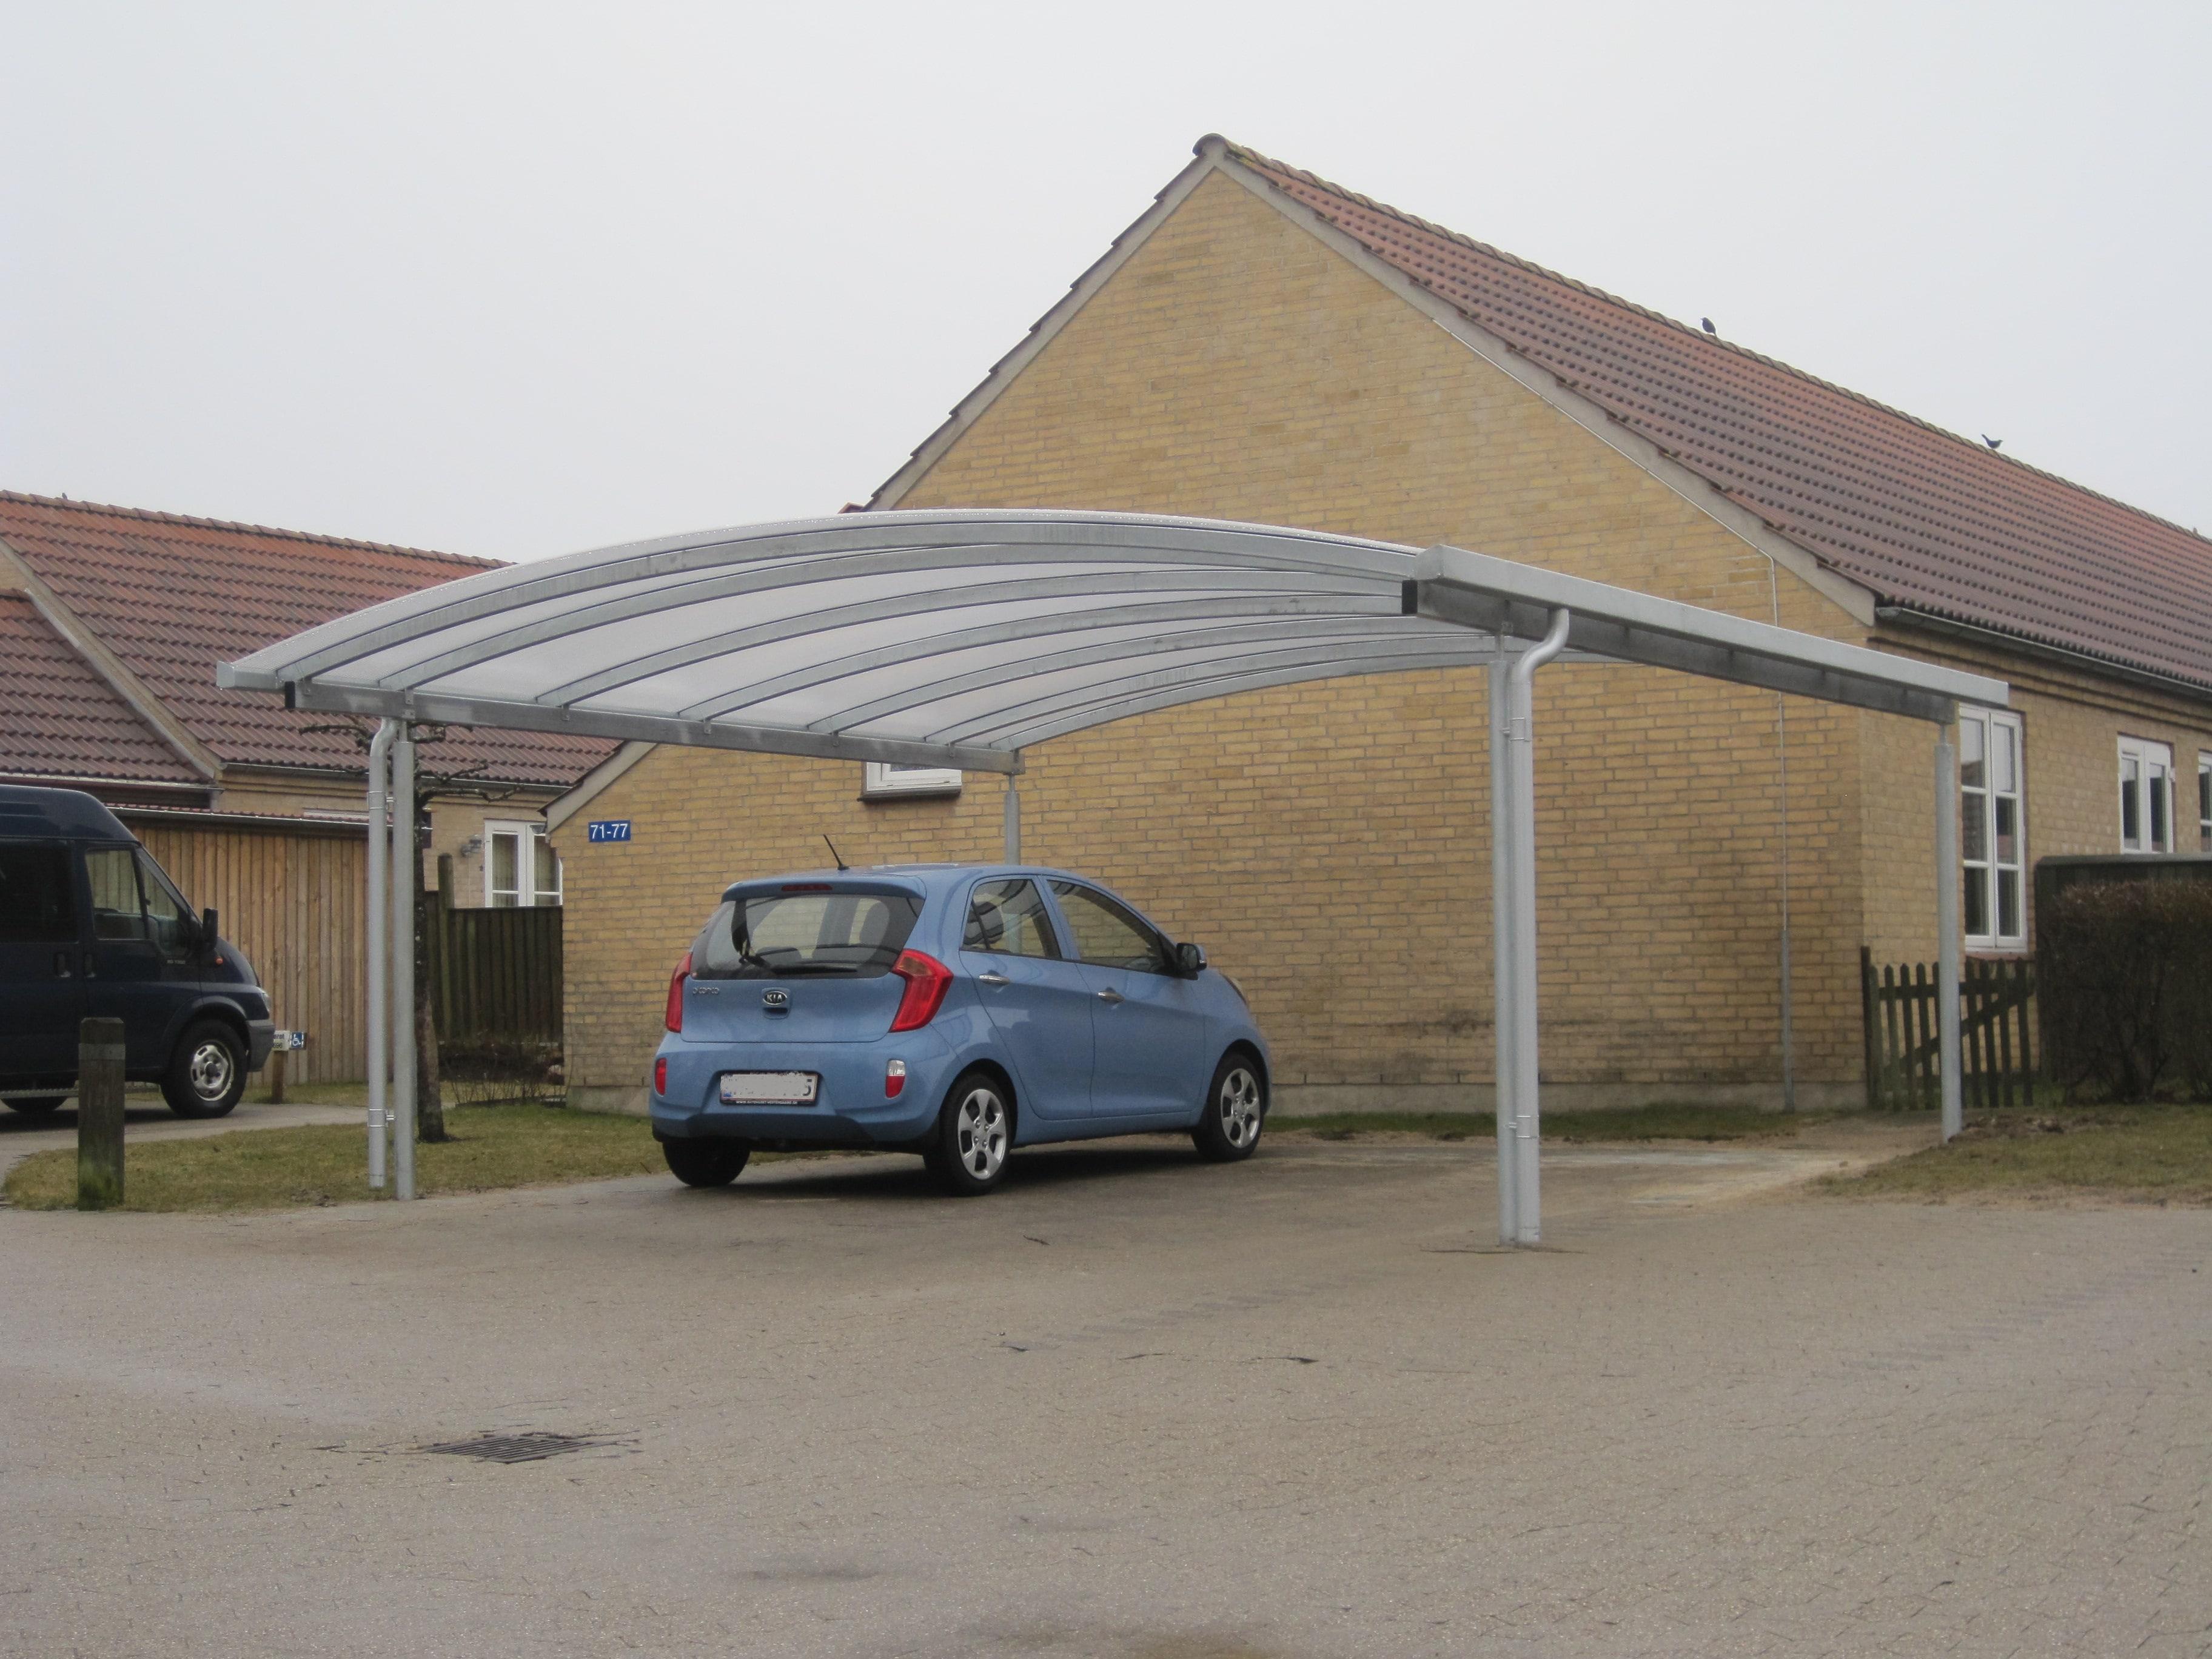 Galerie bogendach stahl carports carport nord carport hamburg